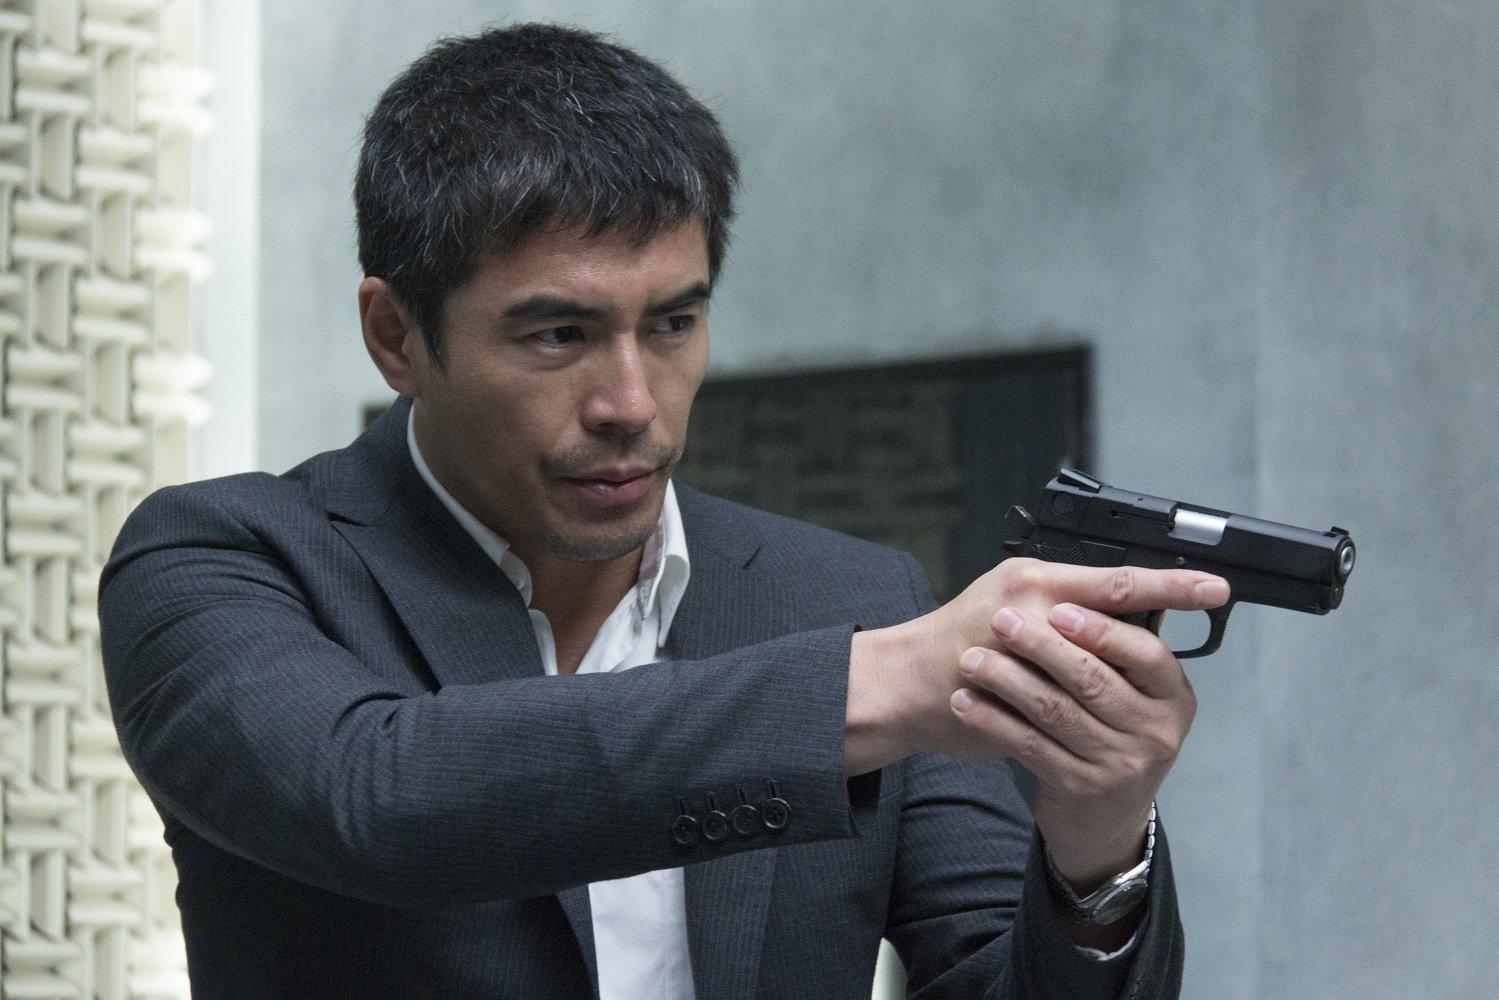 img 5a33fcbab824b - 今をきらめく筋肉俳優・伊藤英明、ブレイクのキッカケは何?